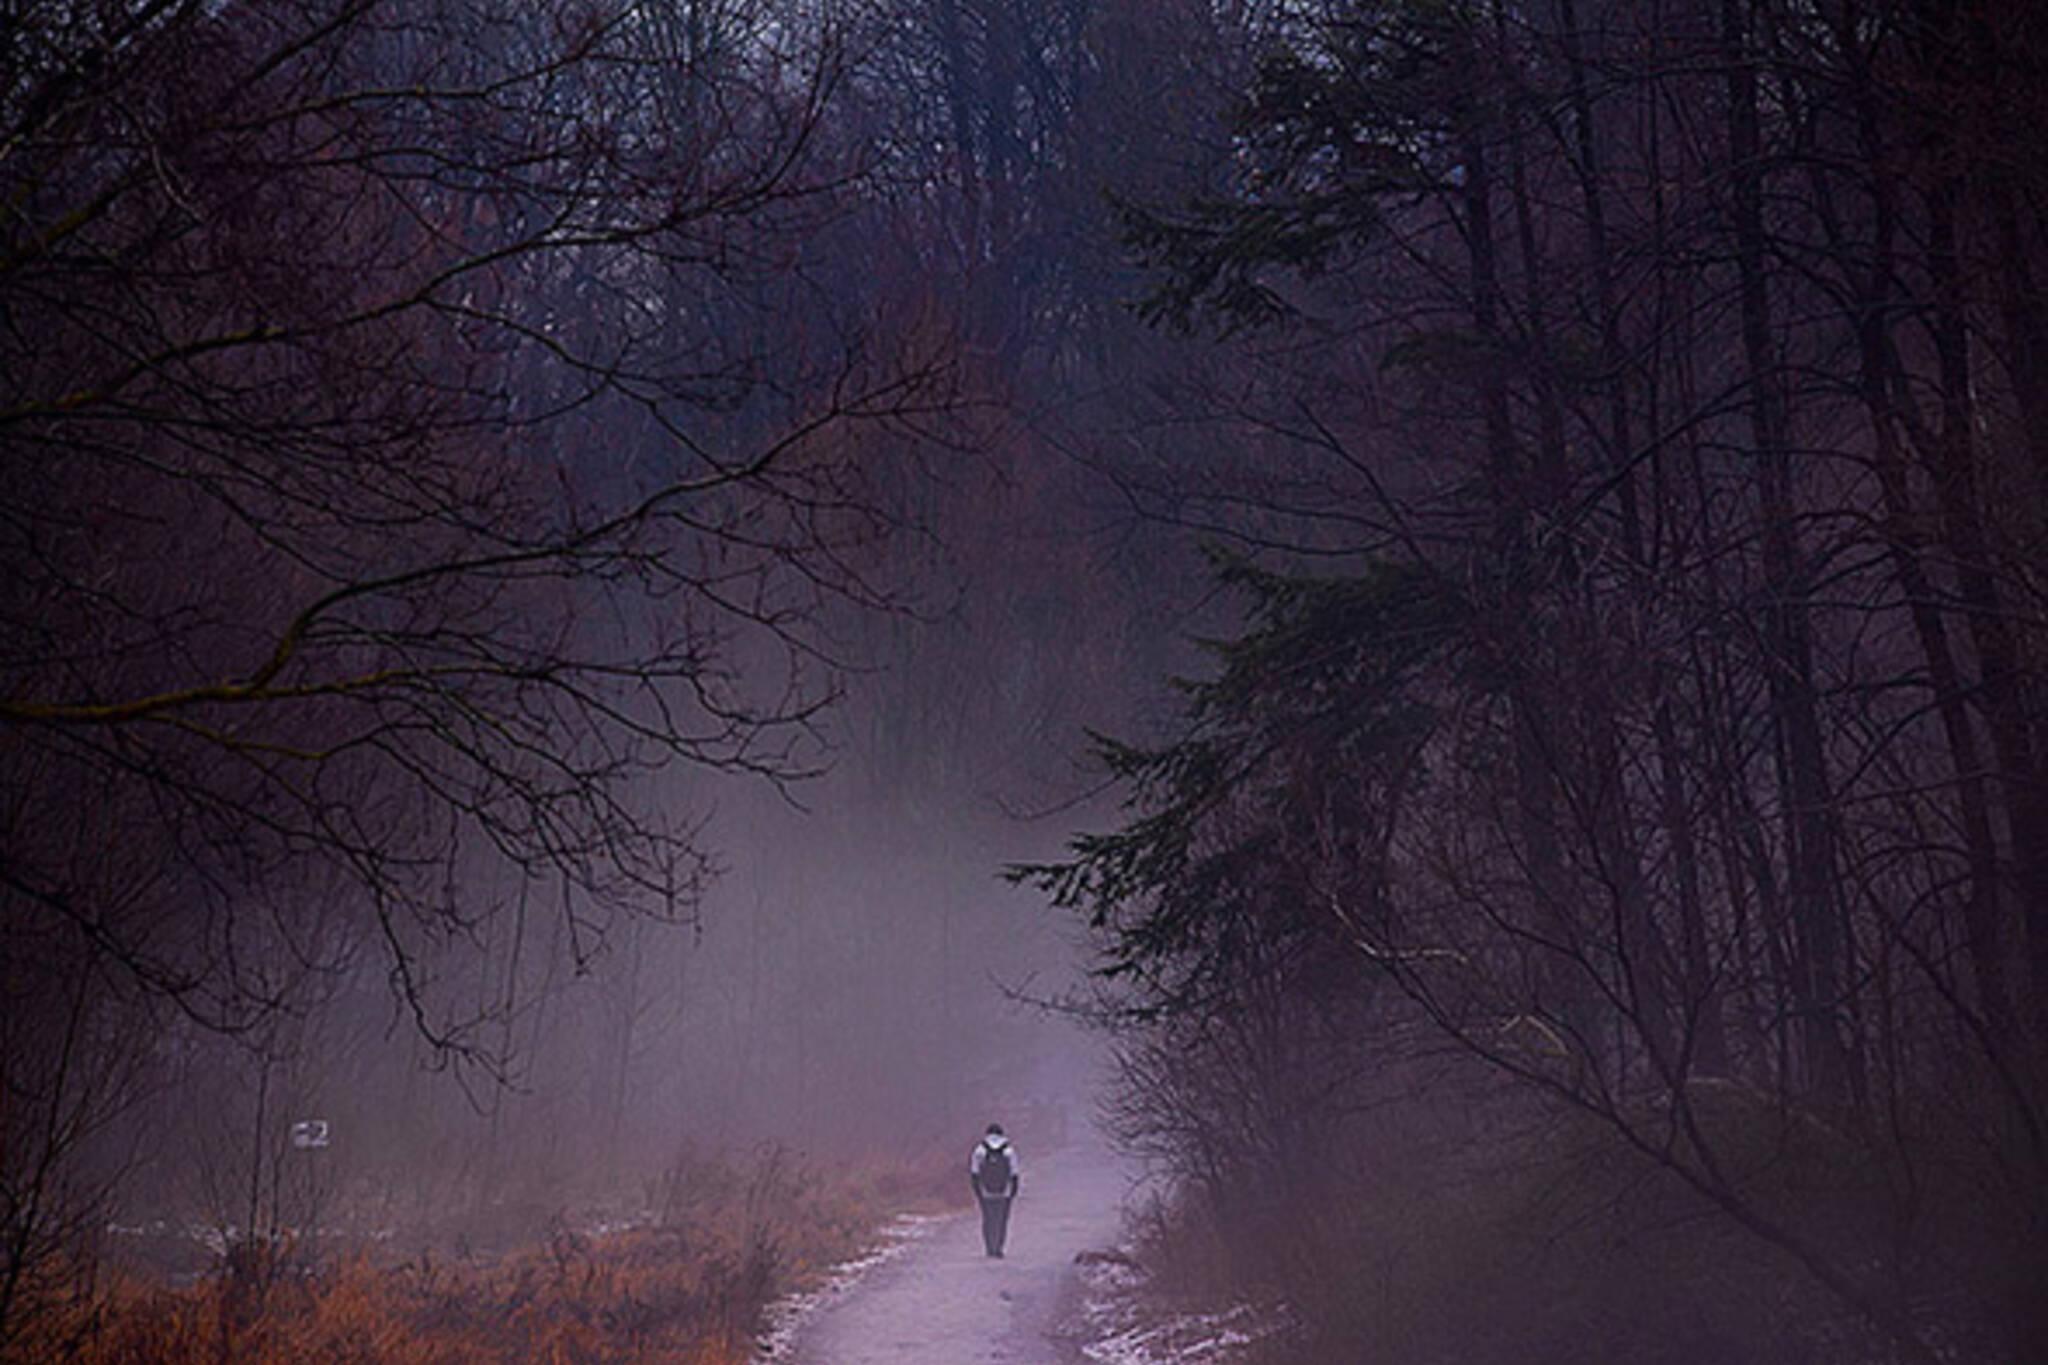 fog, park, alone